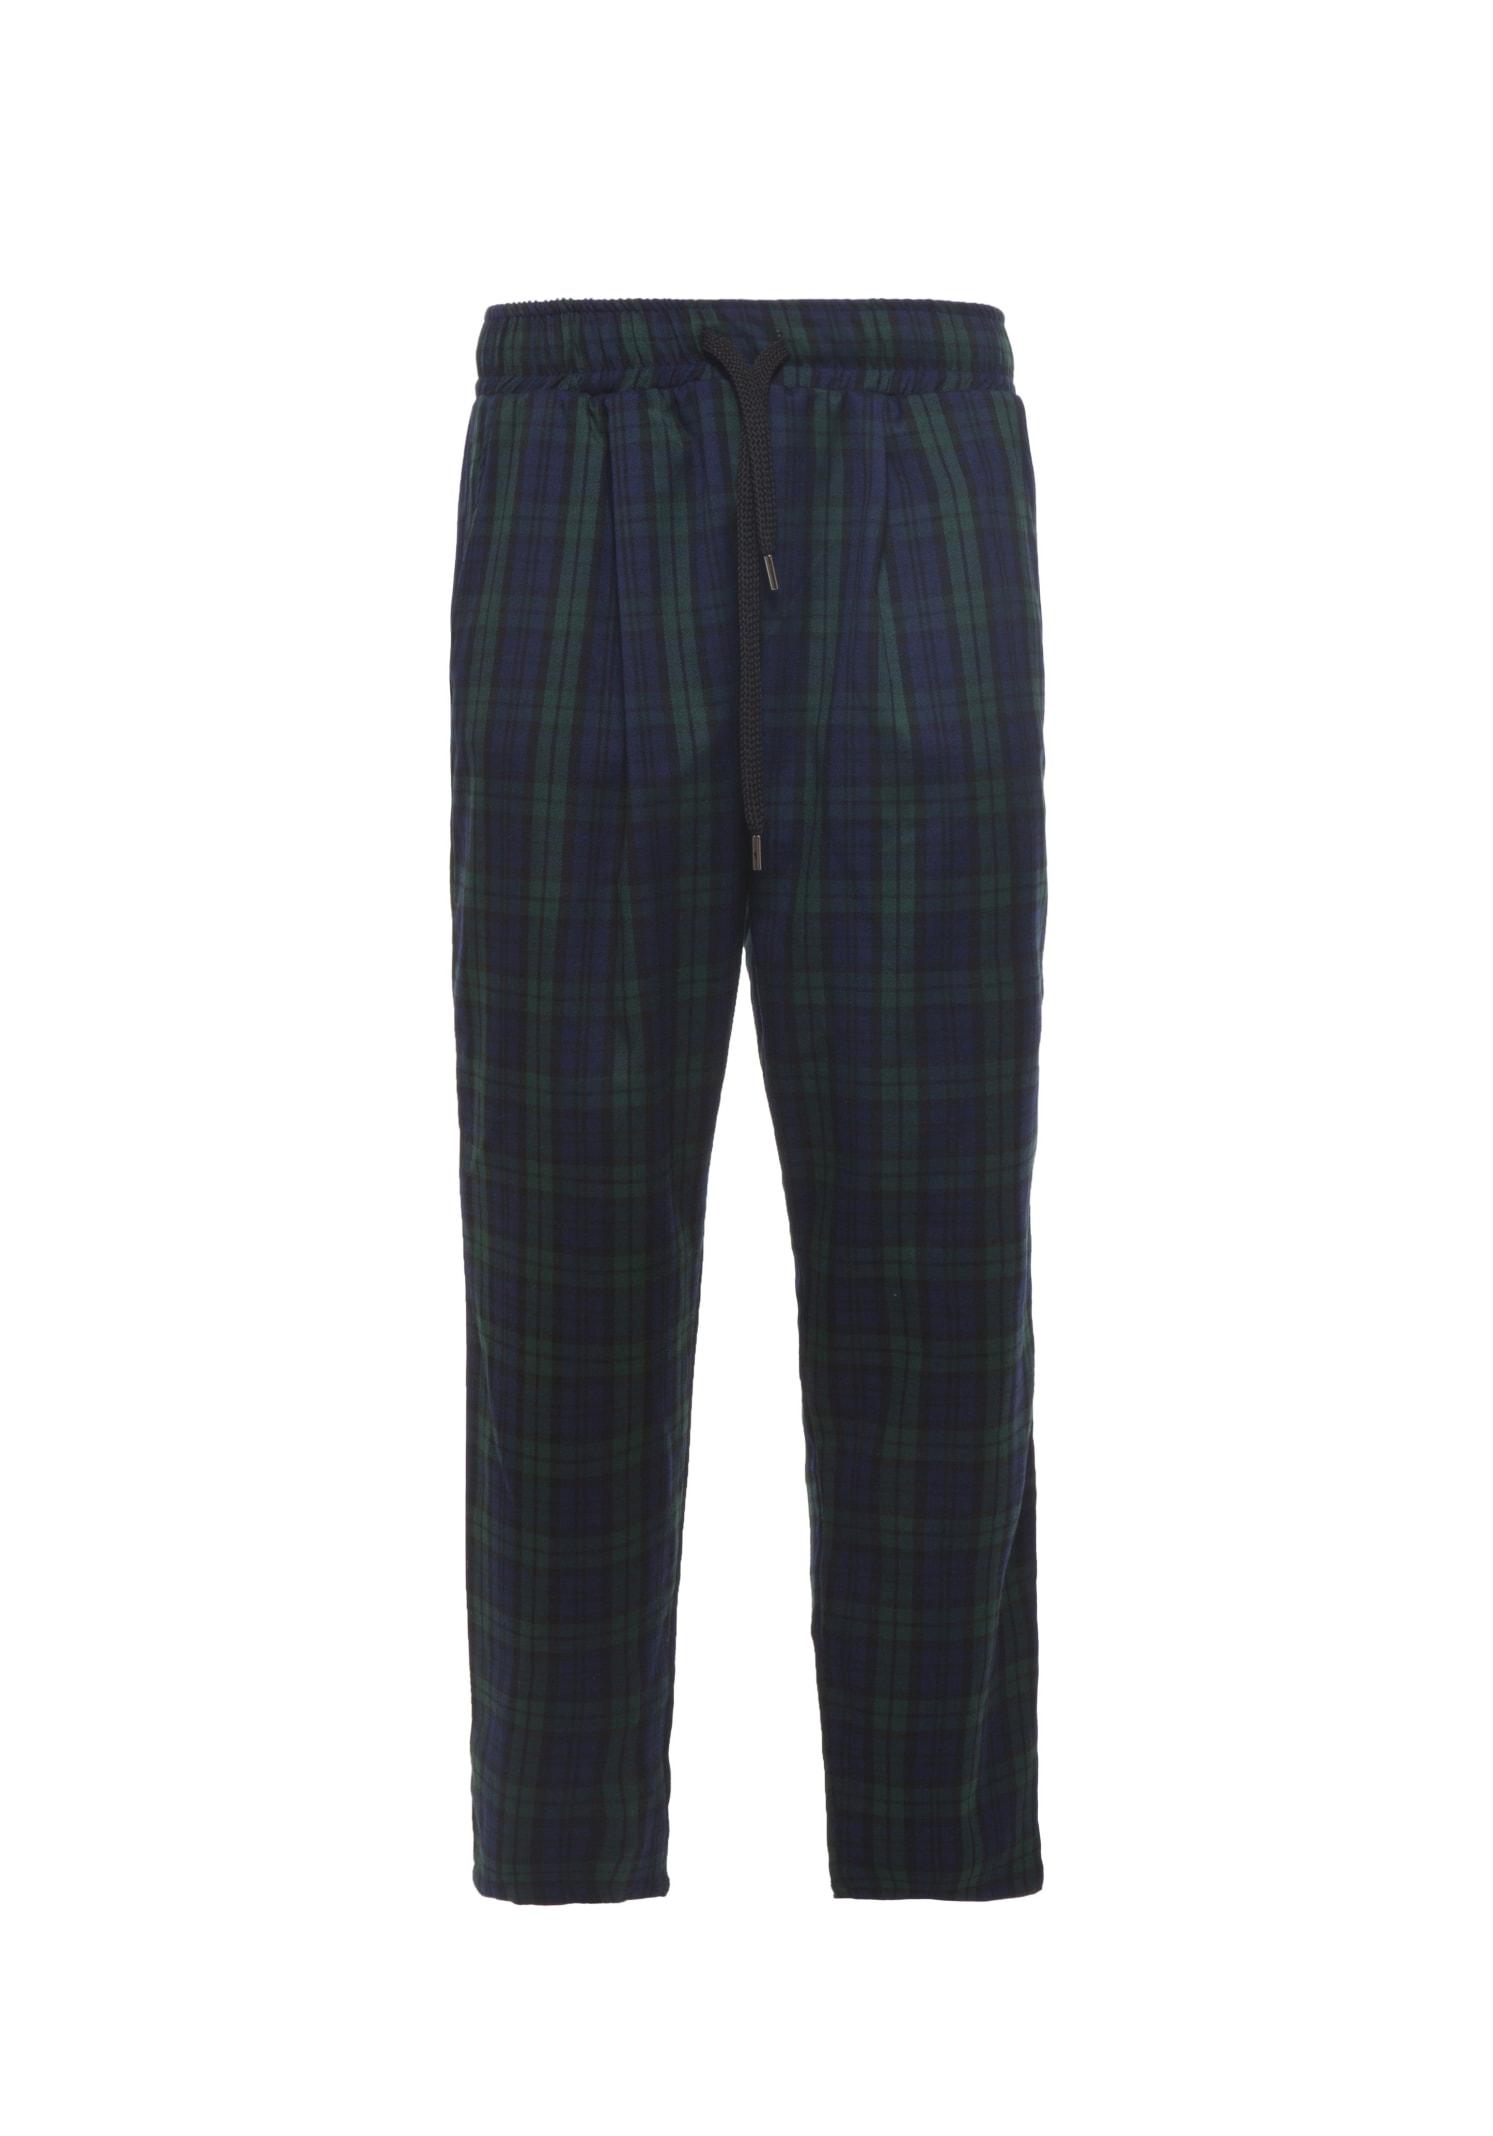 Pants Chino Oxford